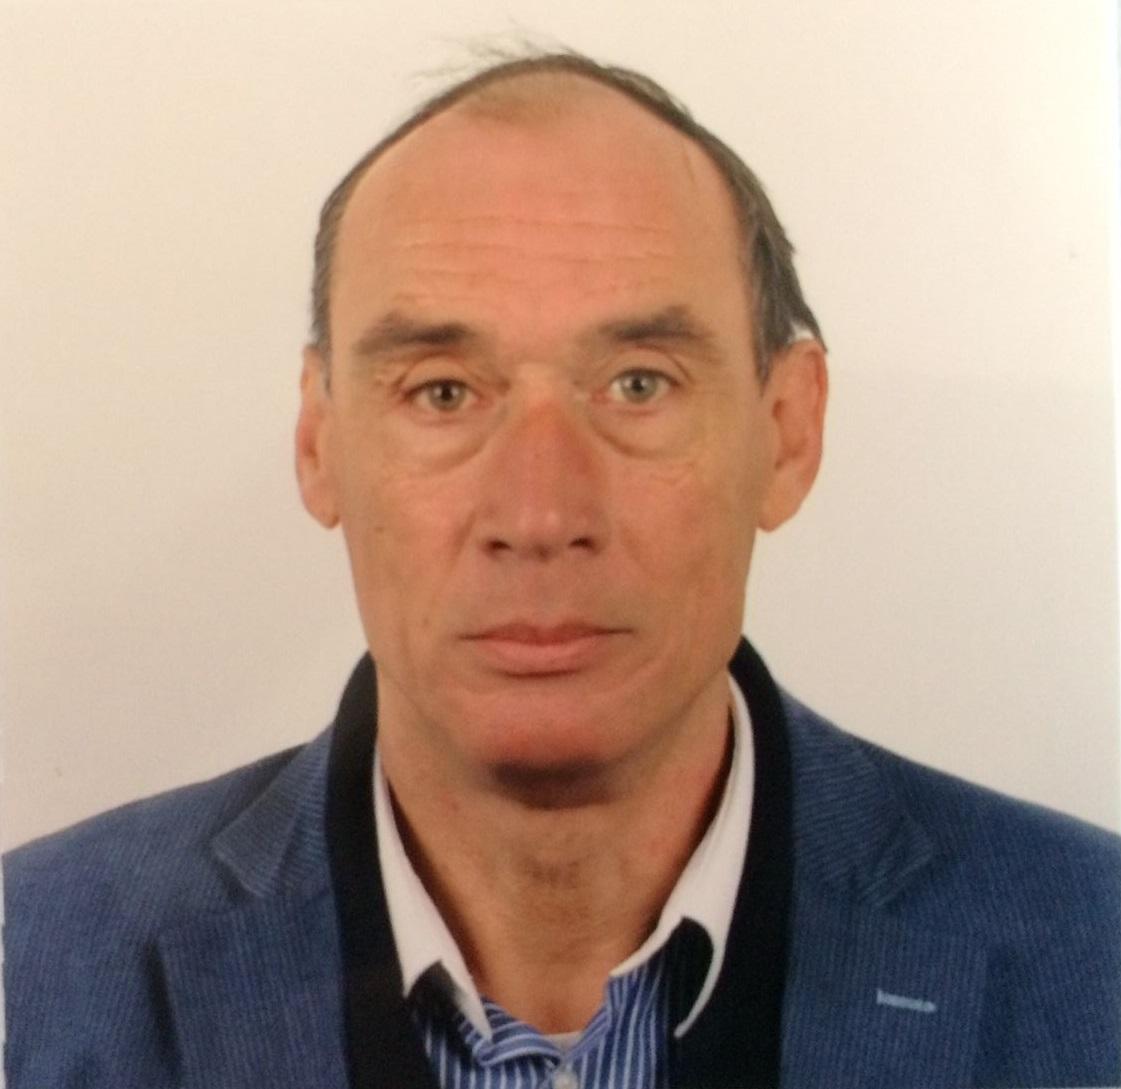 Wolter Jan van der Pers